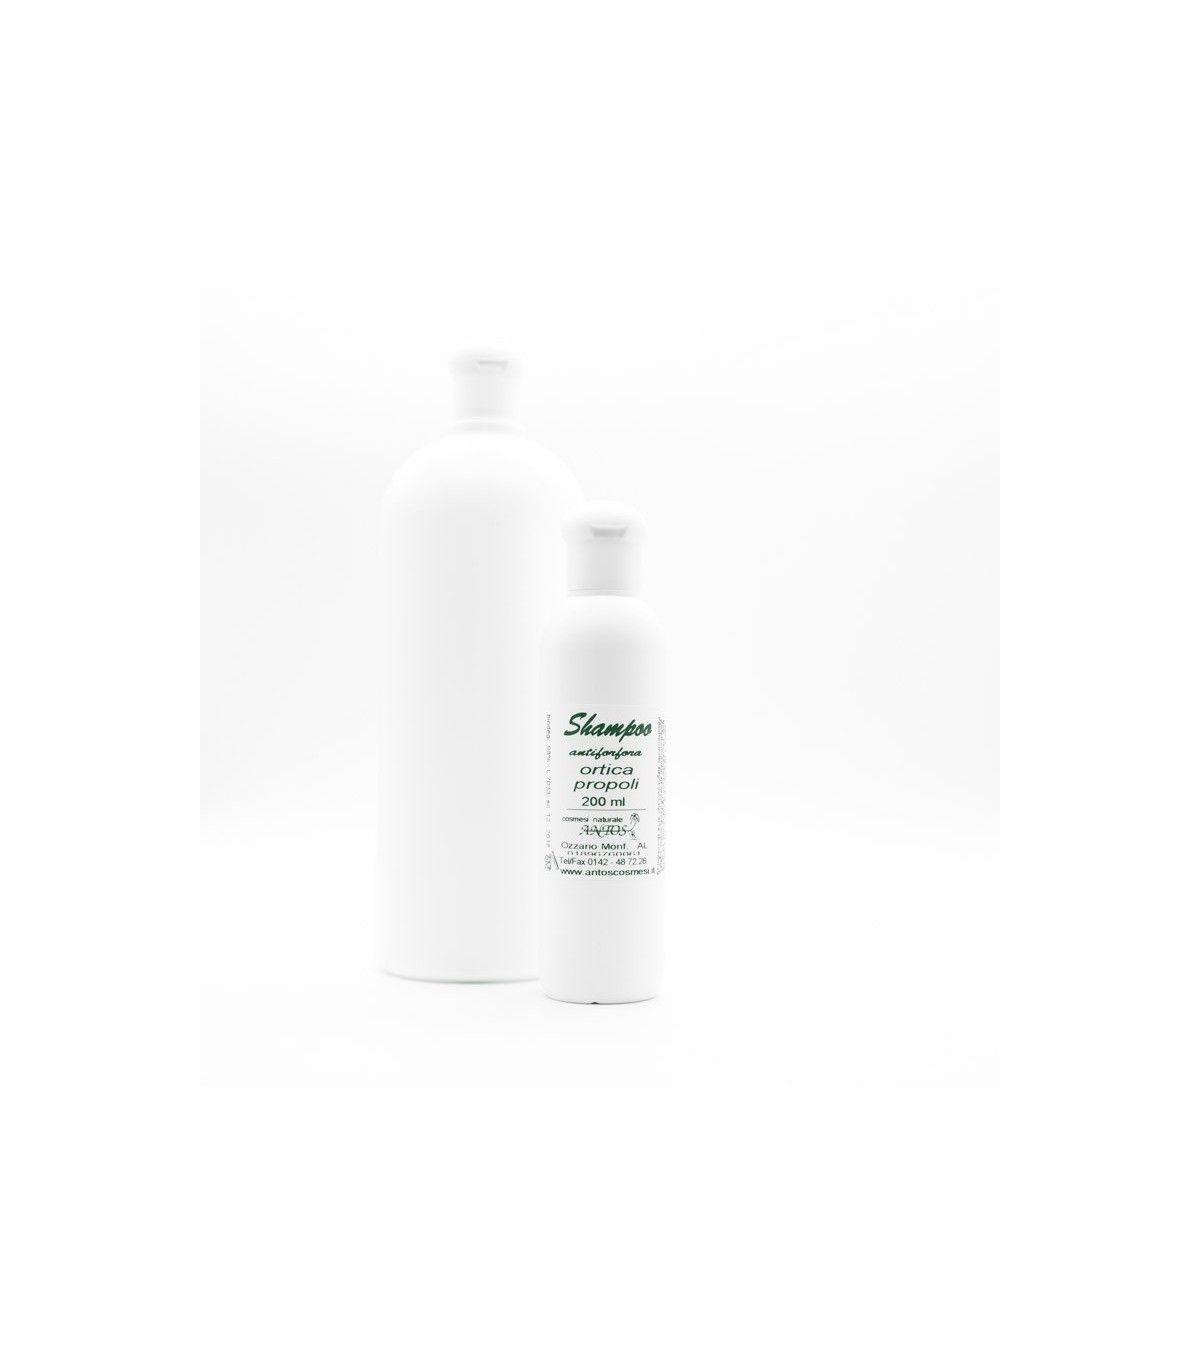 Shampoo antiforfora - litro